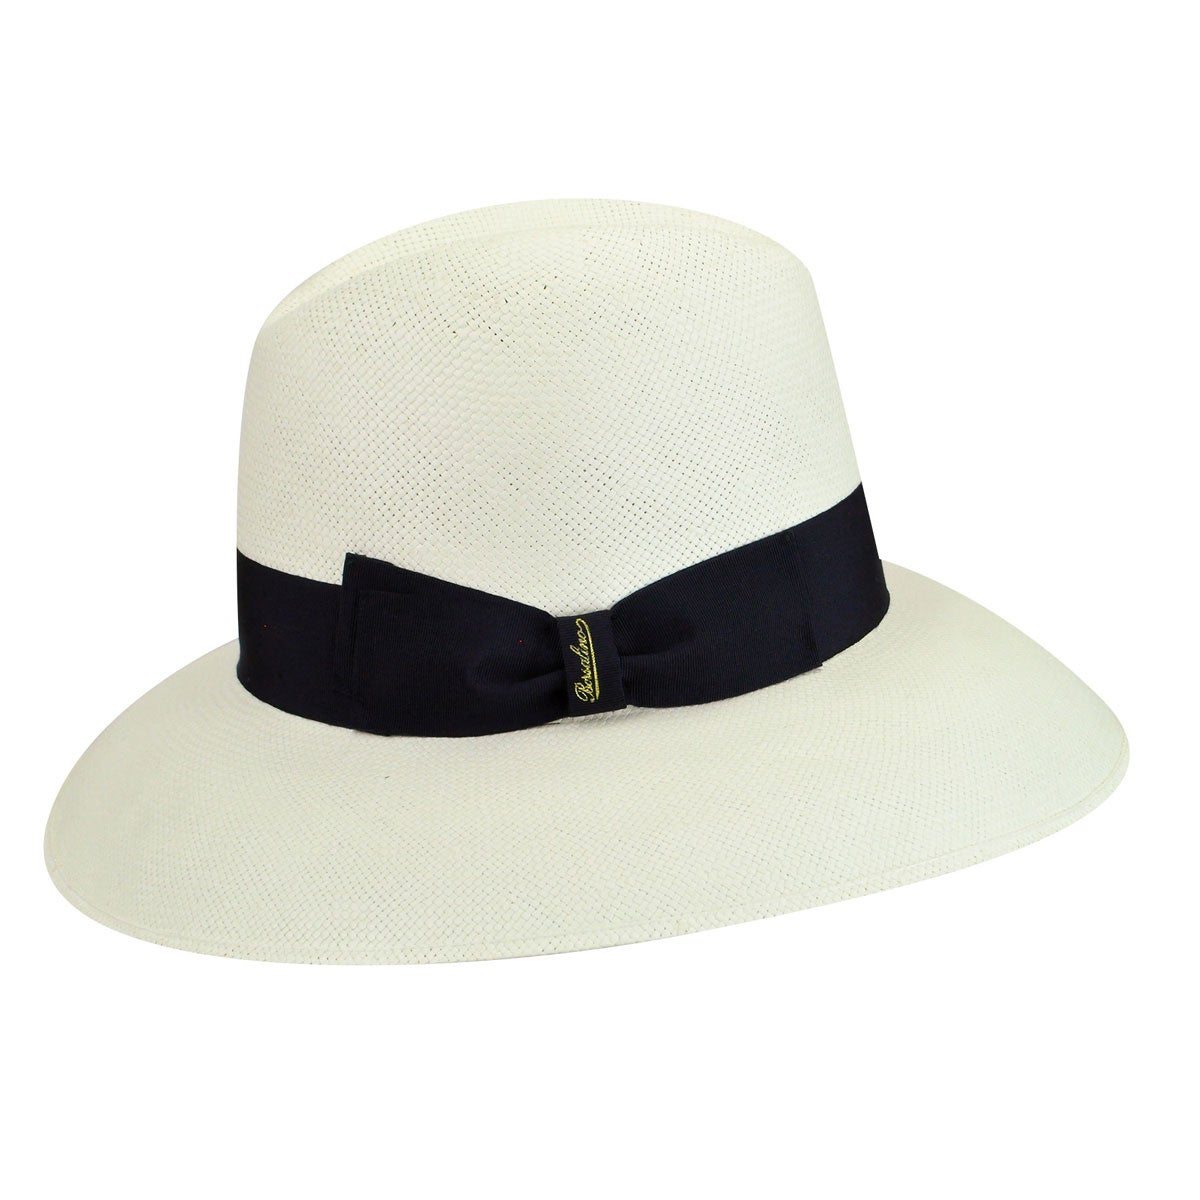 1940s Hats History 232050 Claudette Extra Fine Paper Straw Wide Brim Hat $260.00 AT vintagedancer.com